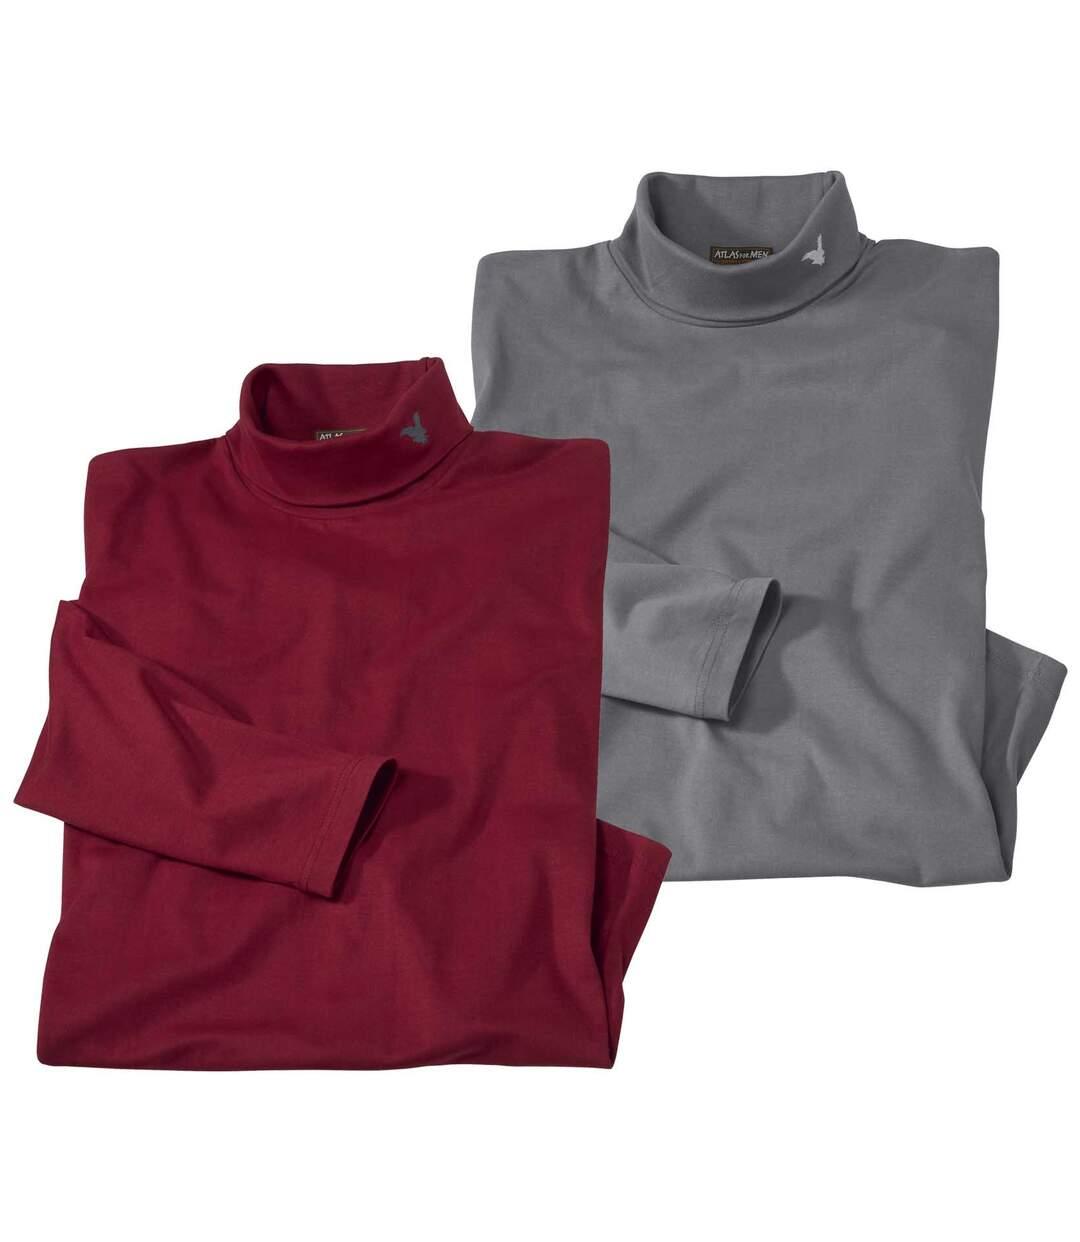 Pack of 2 Men's Cotton Turtleneck Tops - Burgundy, Grey